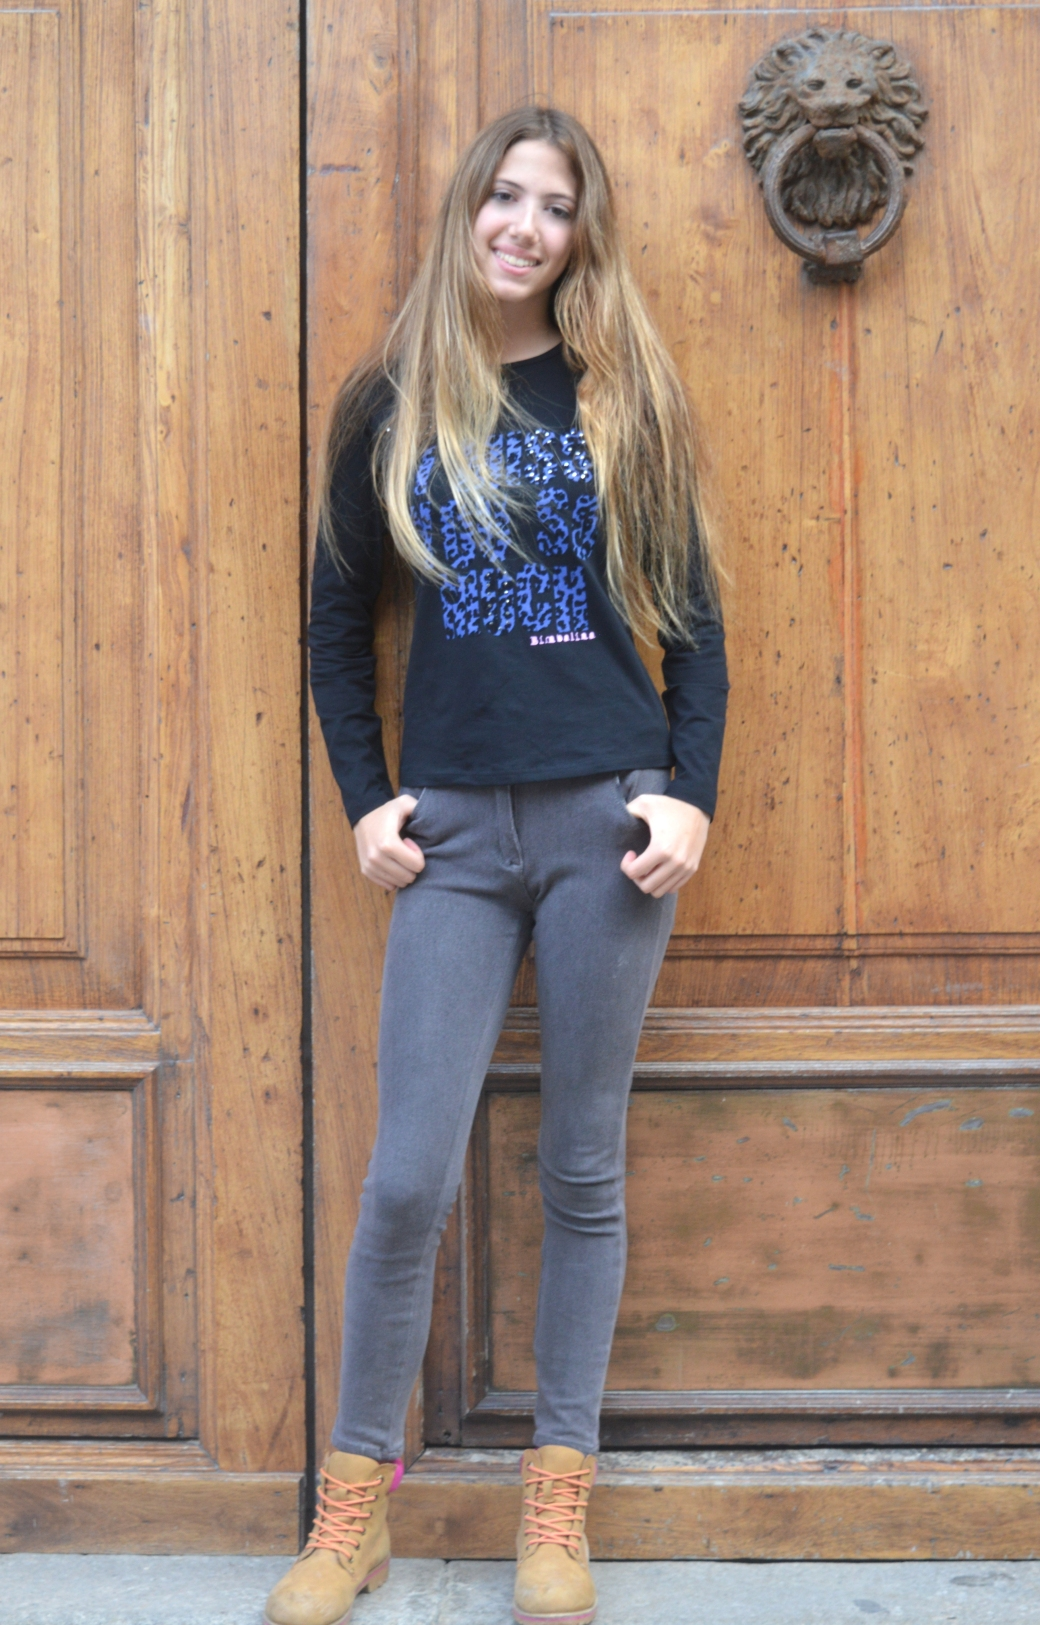 bimbalina teen moda